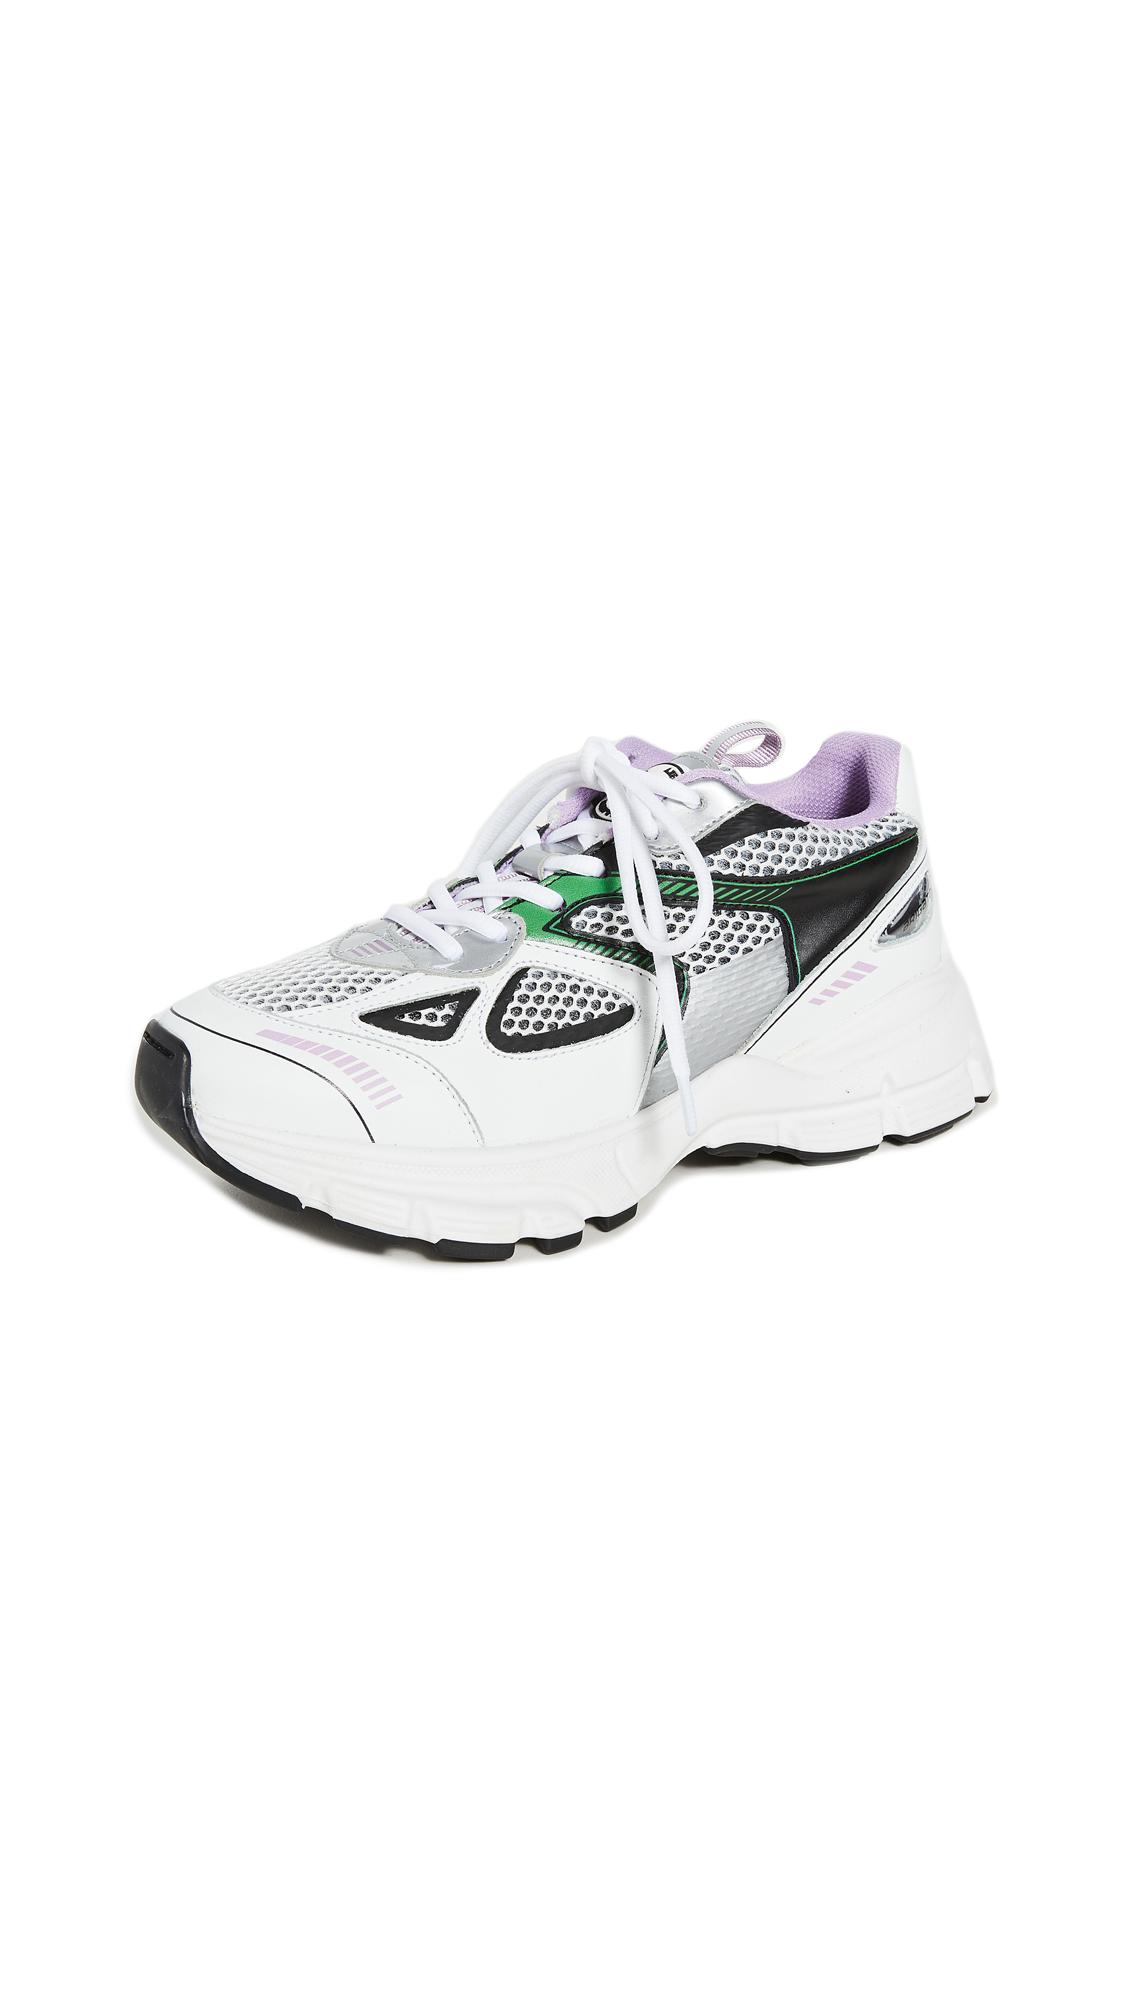 Axel Arigato Marathon Sneakers - 40% Off Sale